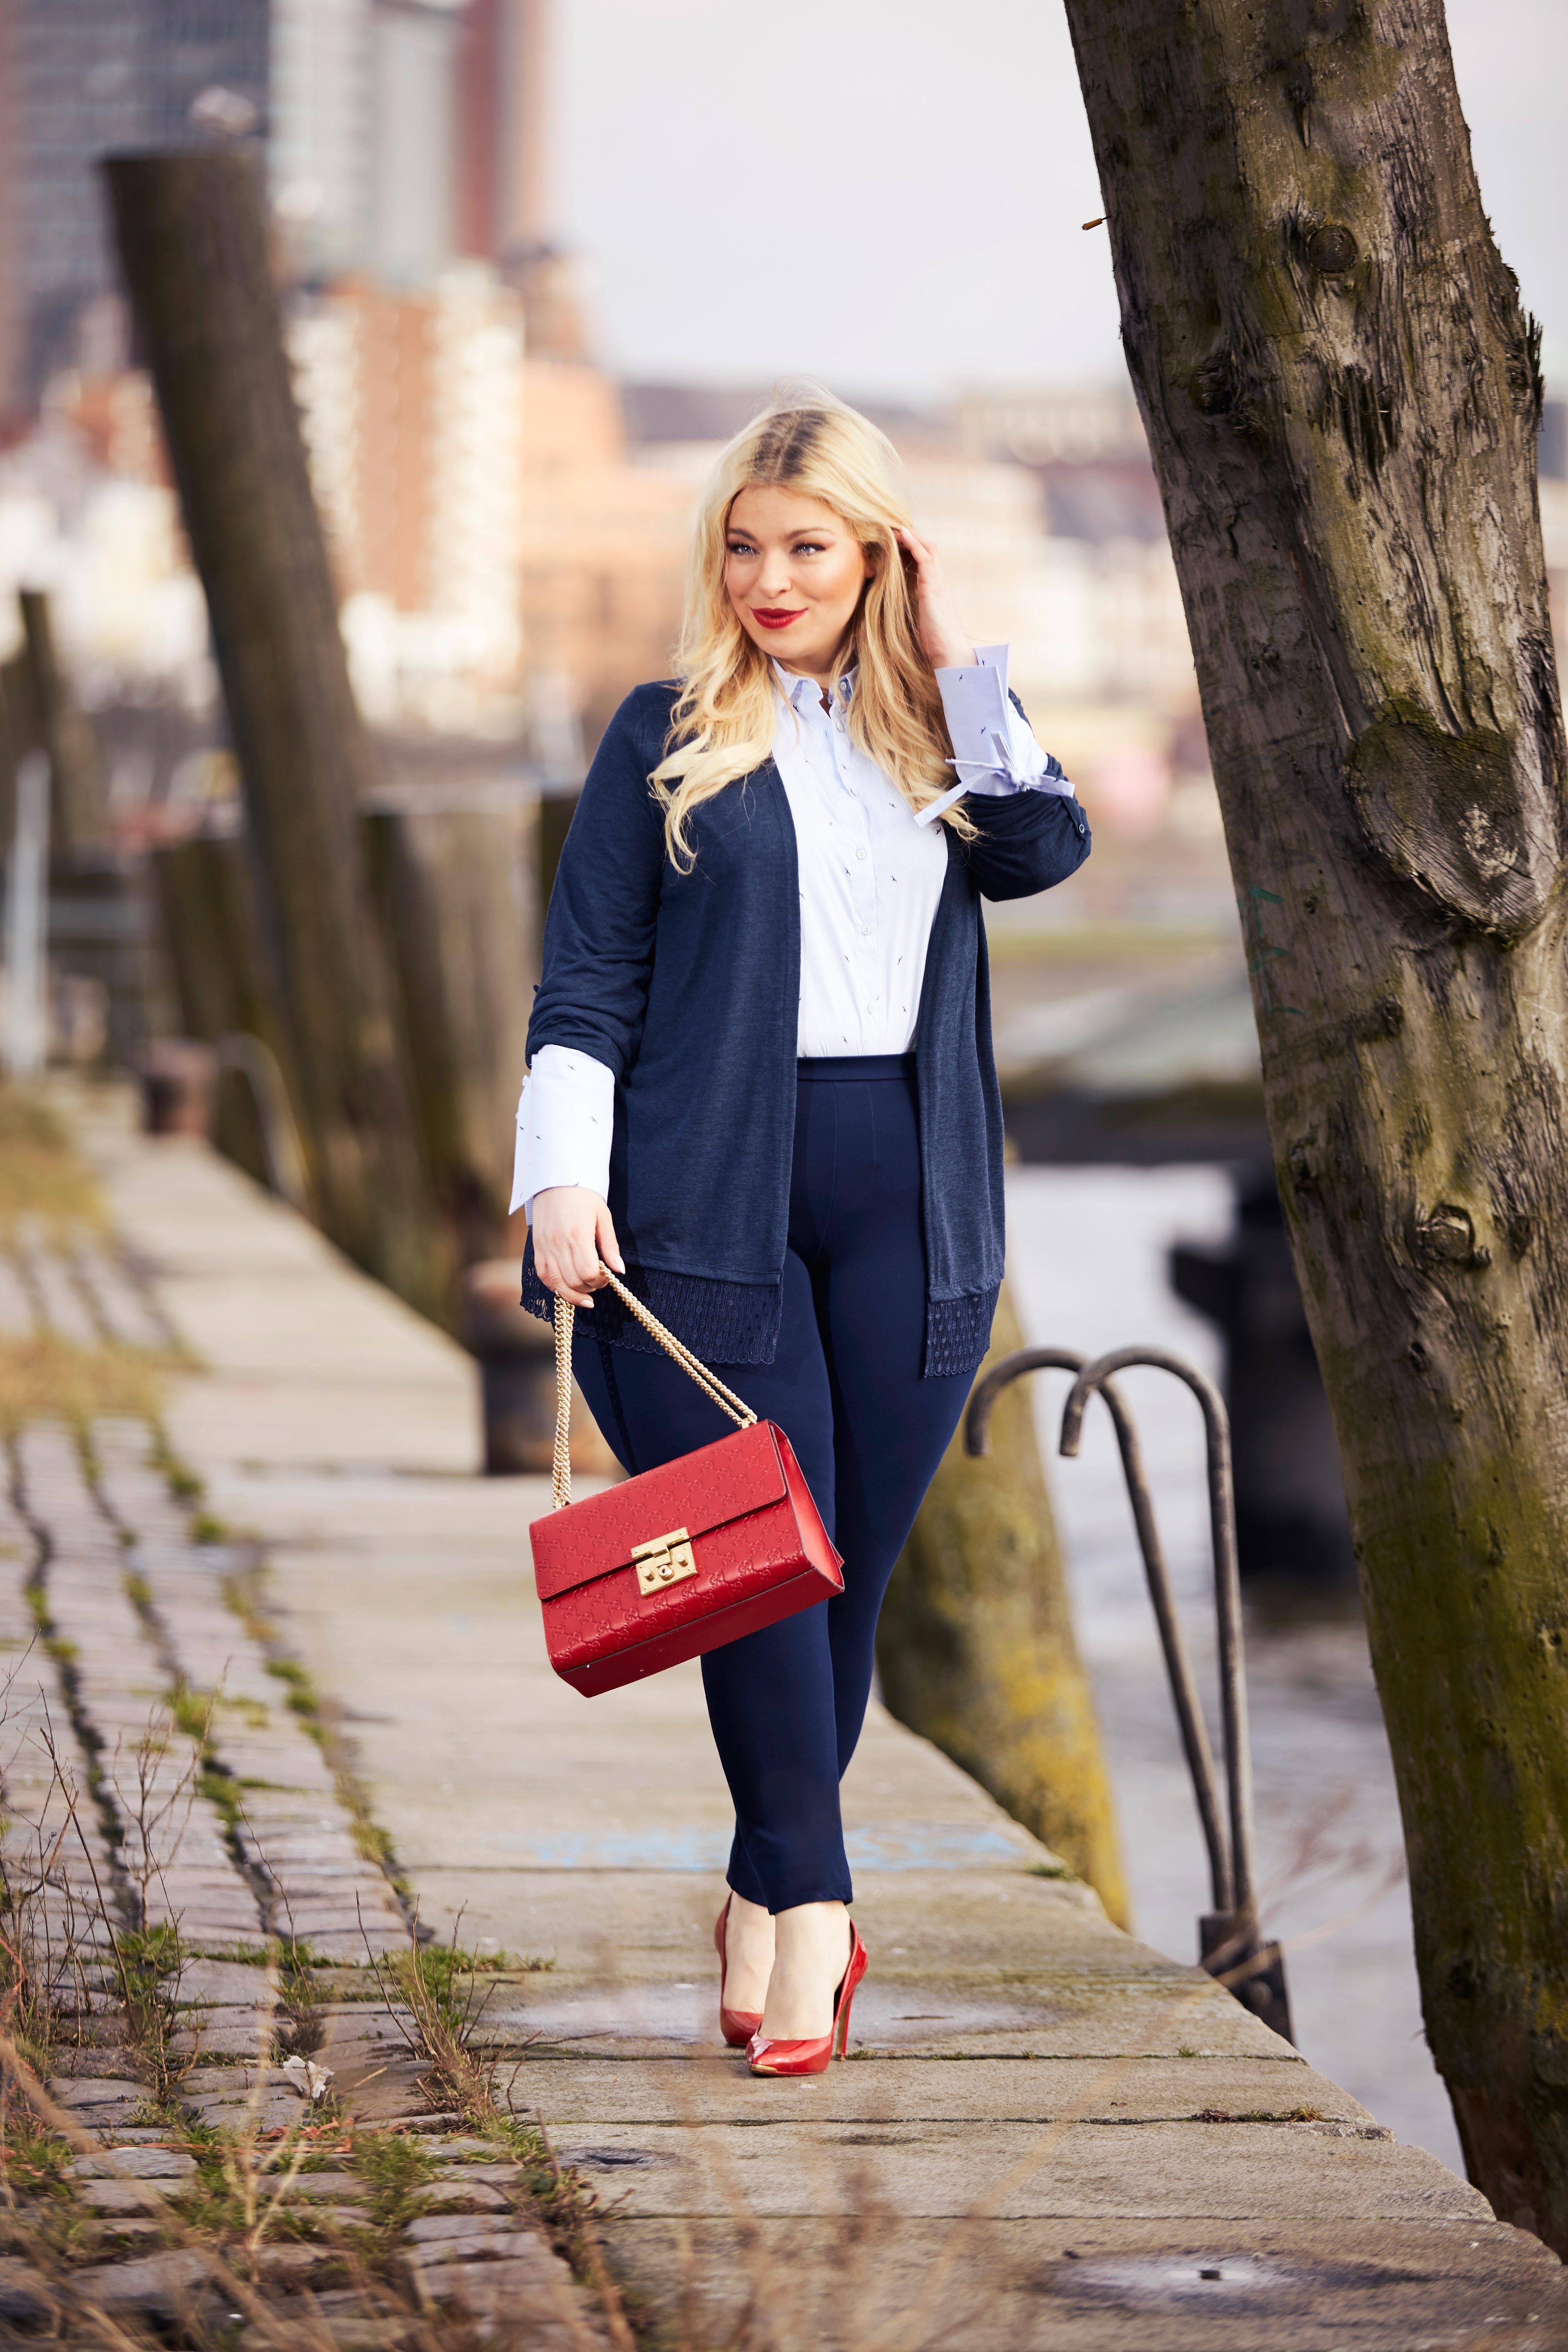 Caterina-pogorzelski-Megabambi-Curvy-Fashion-Plussize-blogger